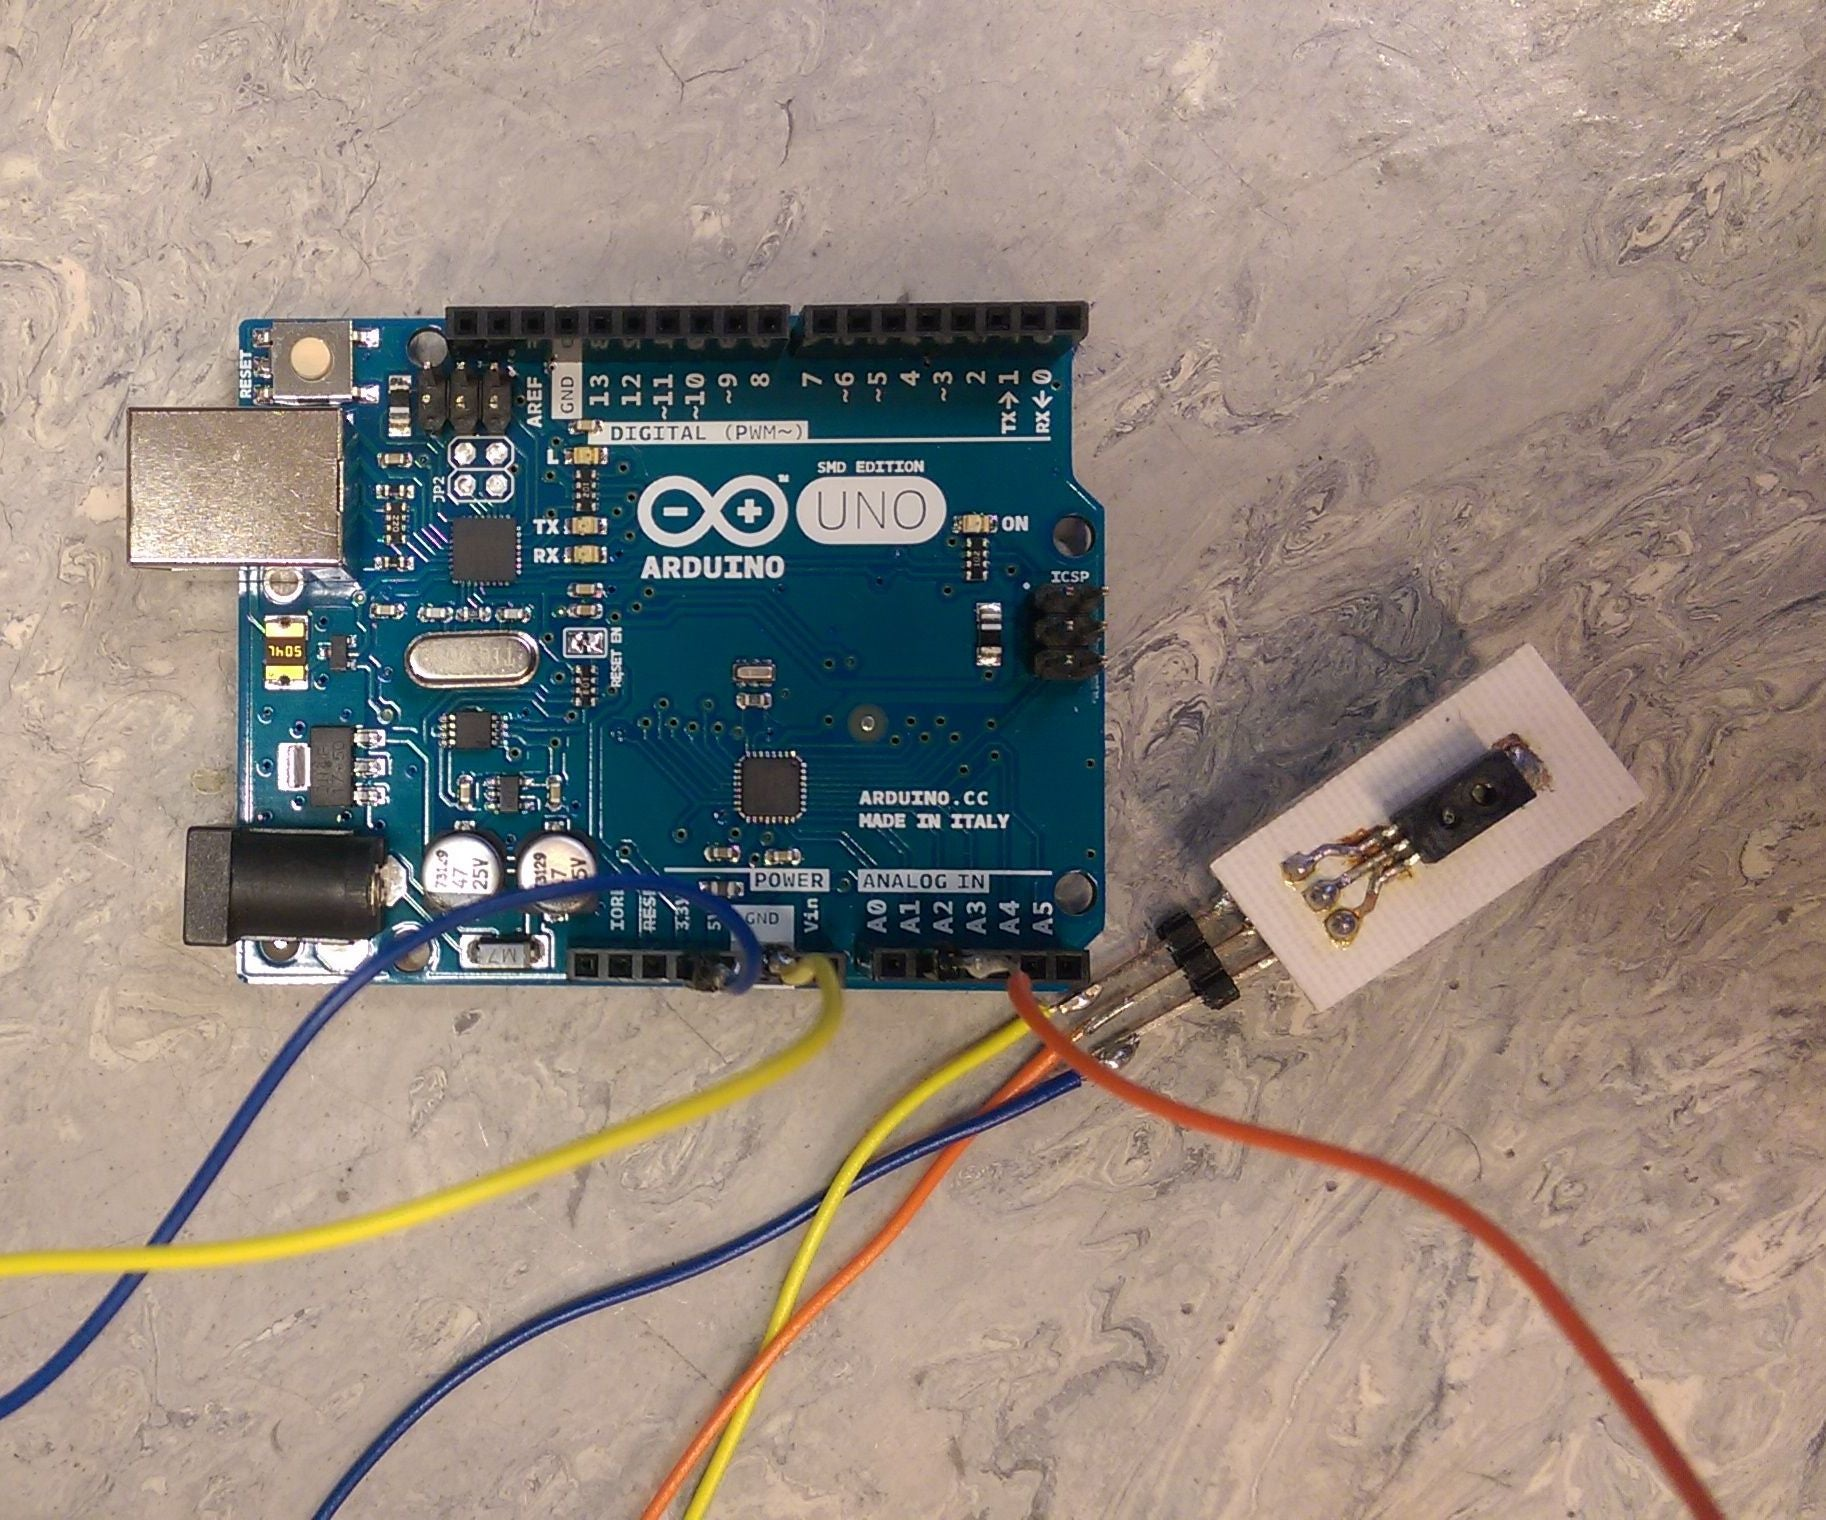 Diybigworld CJMCU-1101 HS1101 Humidity Sensor Relative Humidity Sensor